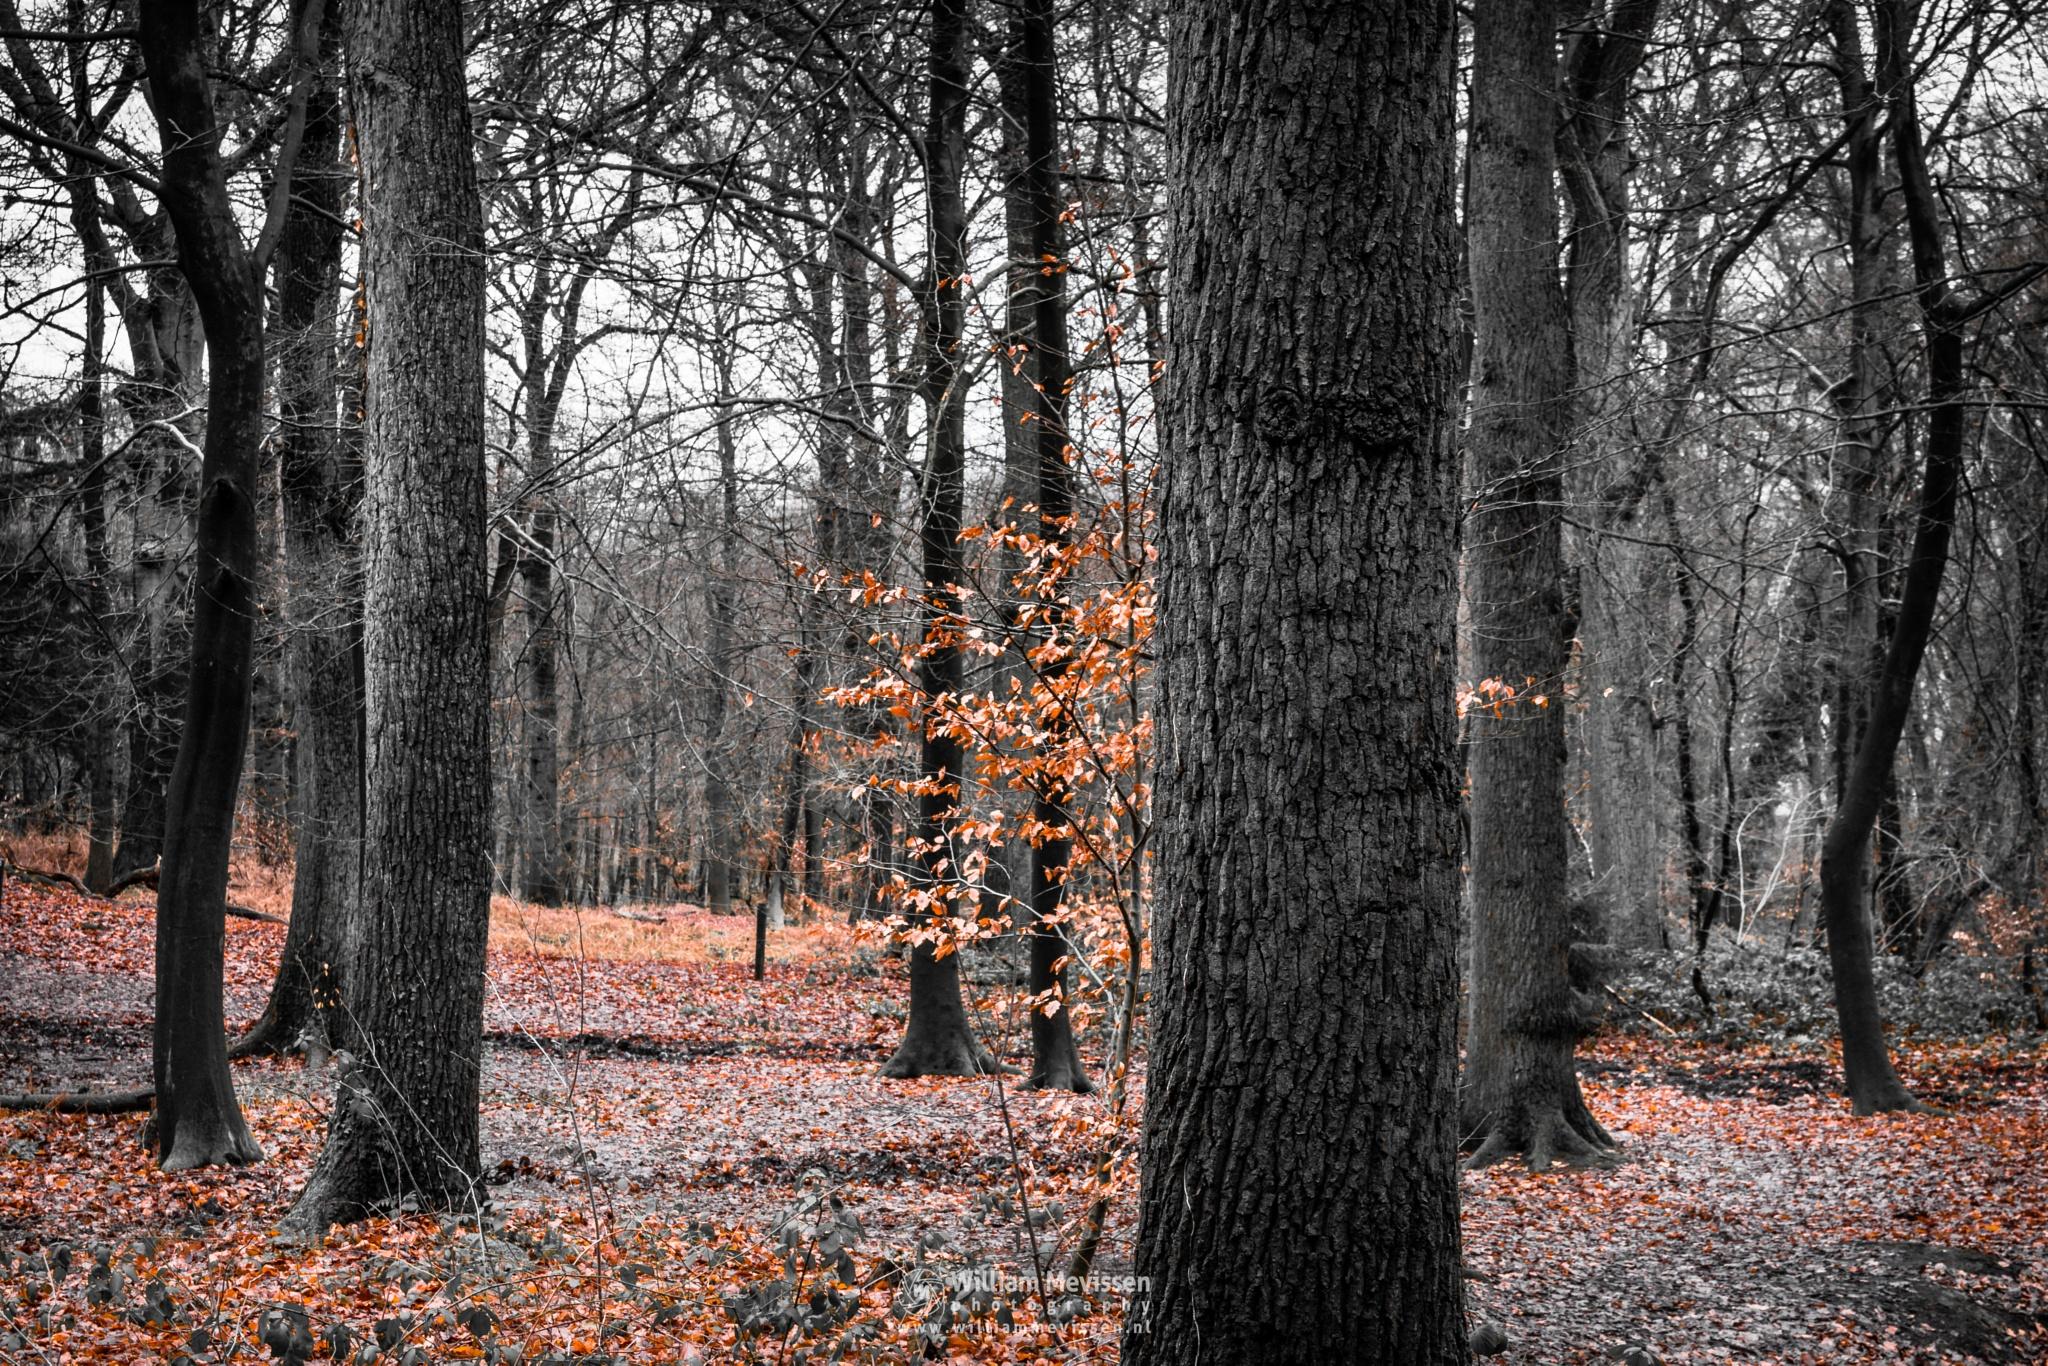 A Touch of Autumn by William Mevissen